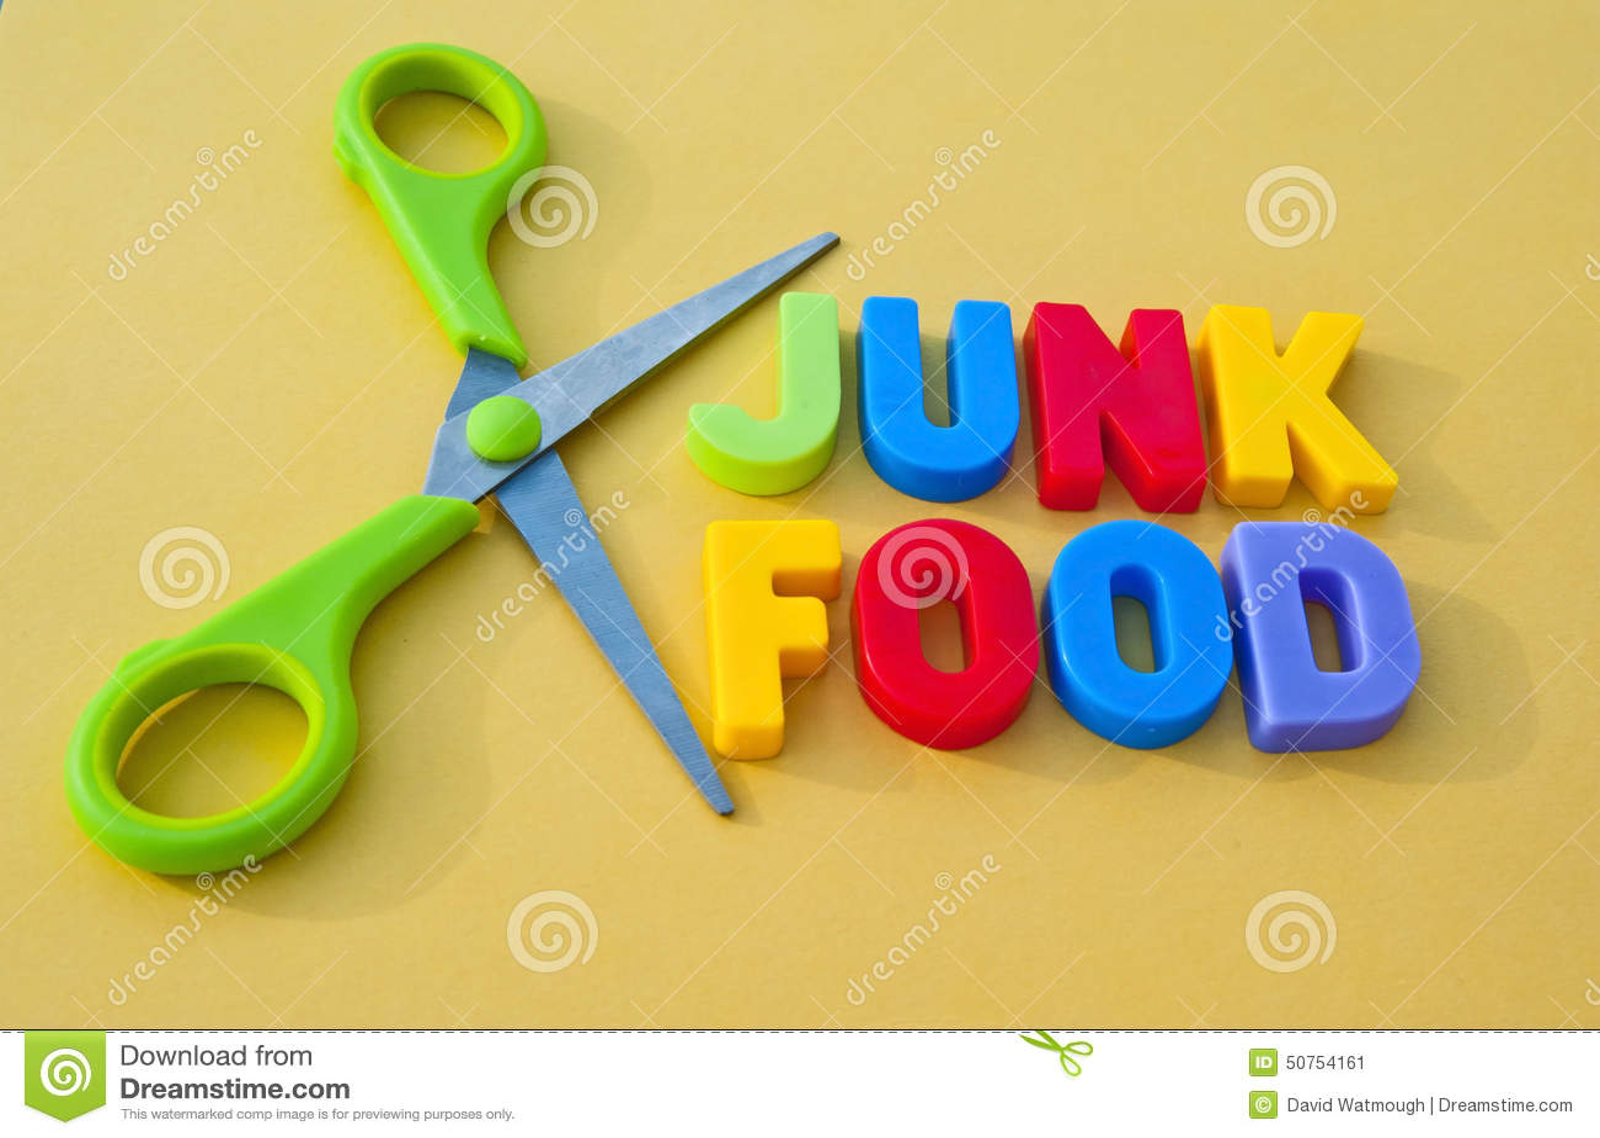 Comida lixo cortada